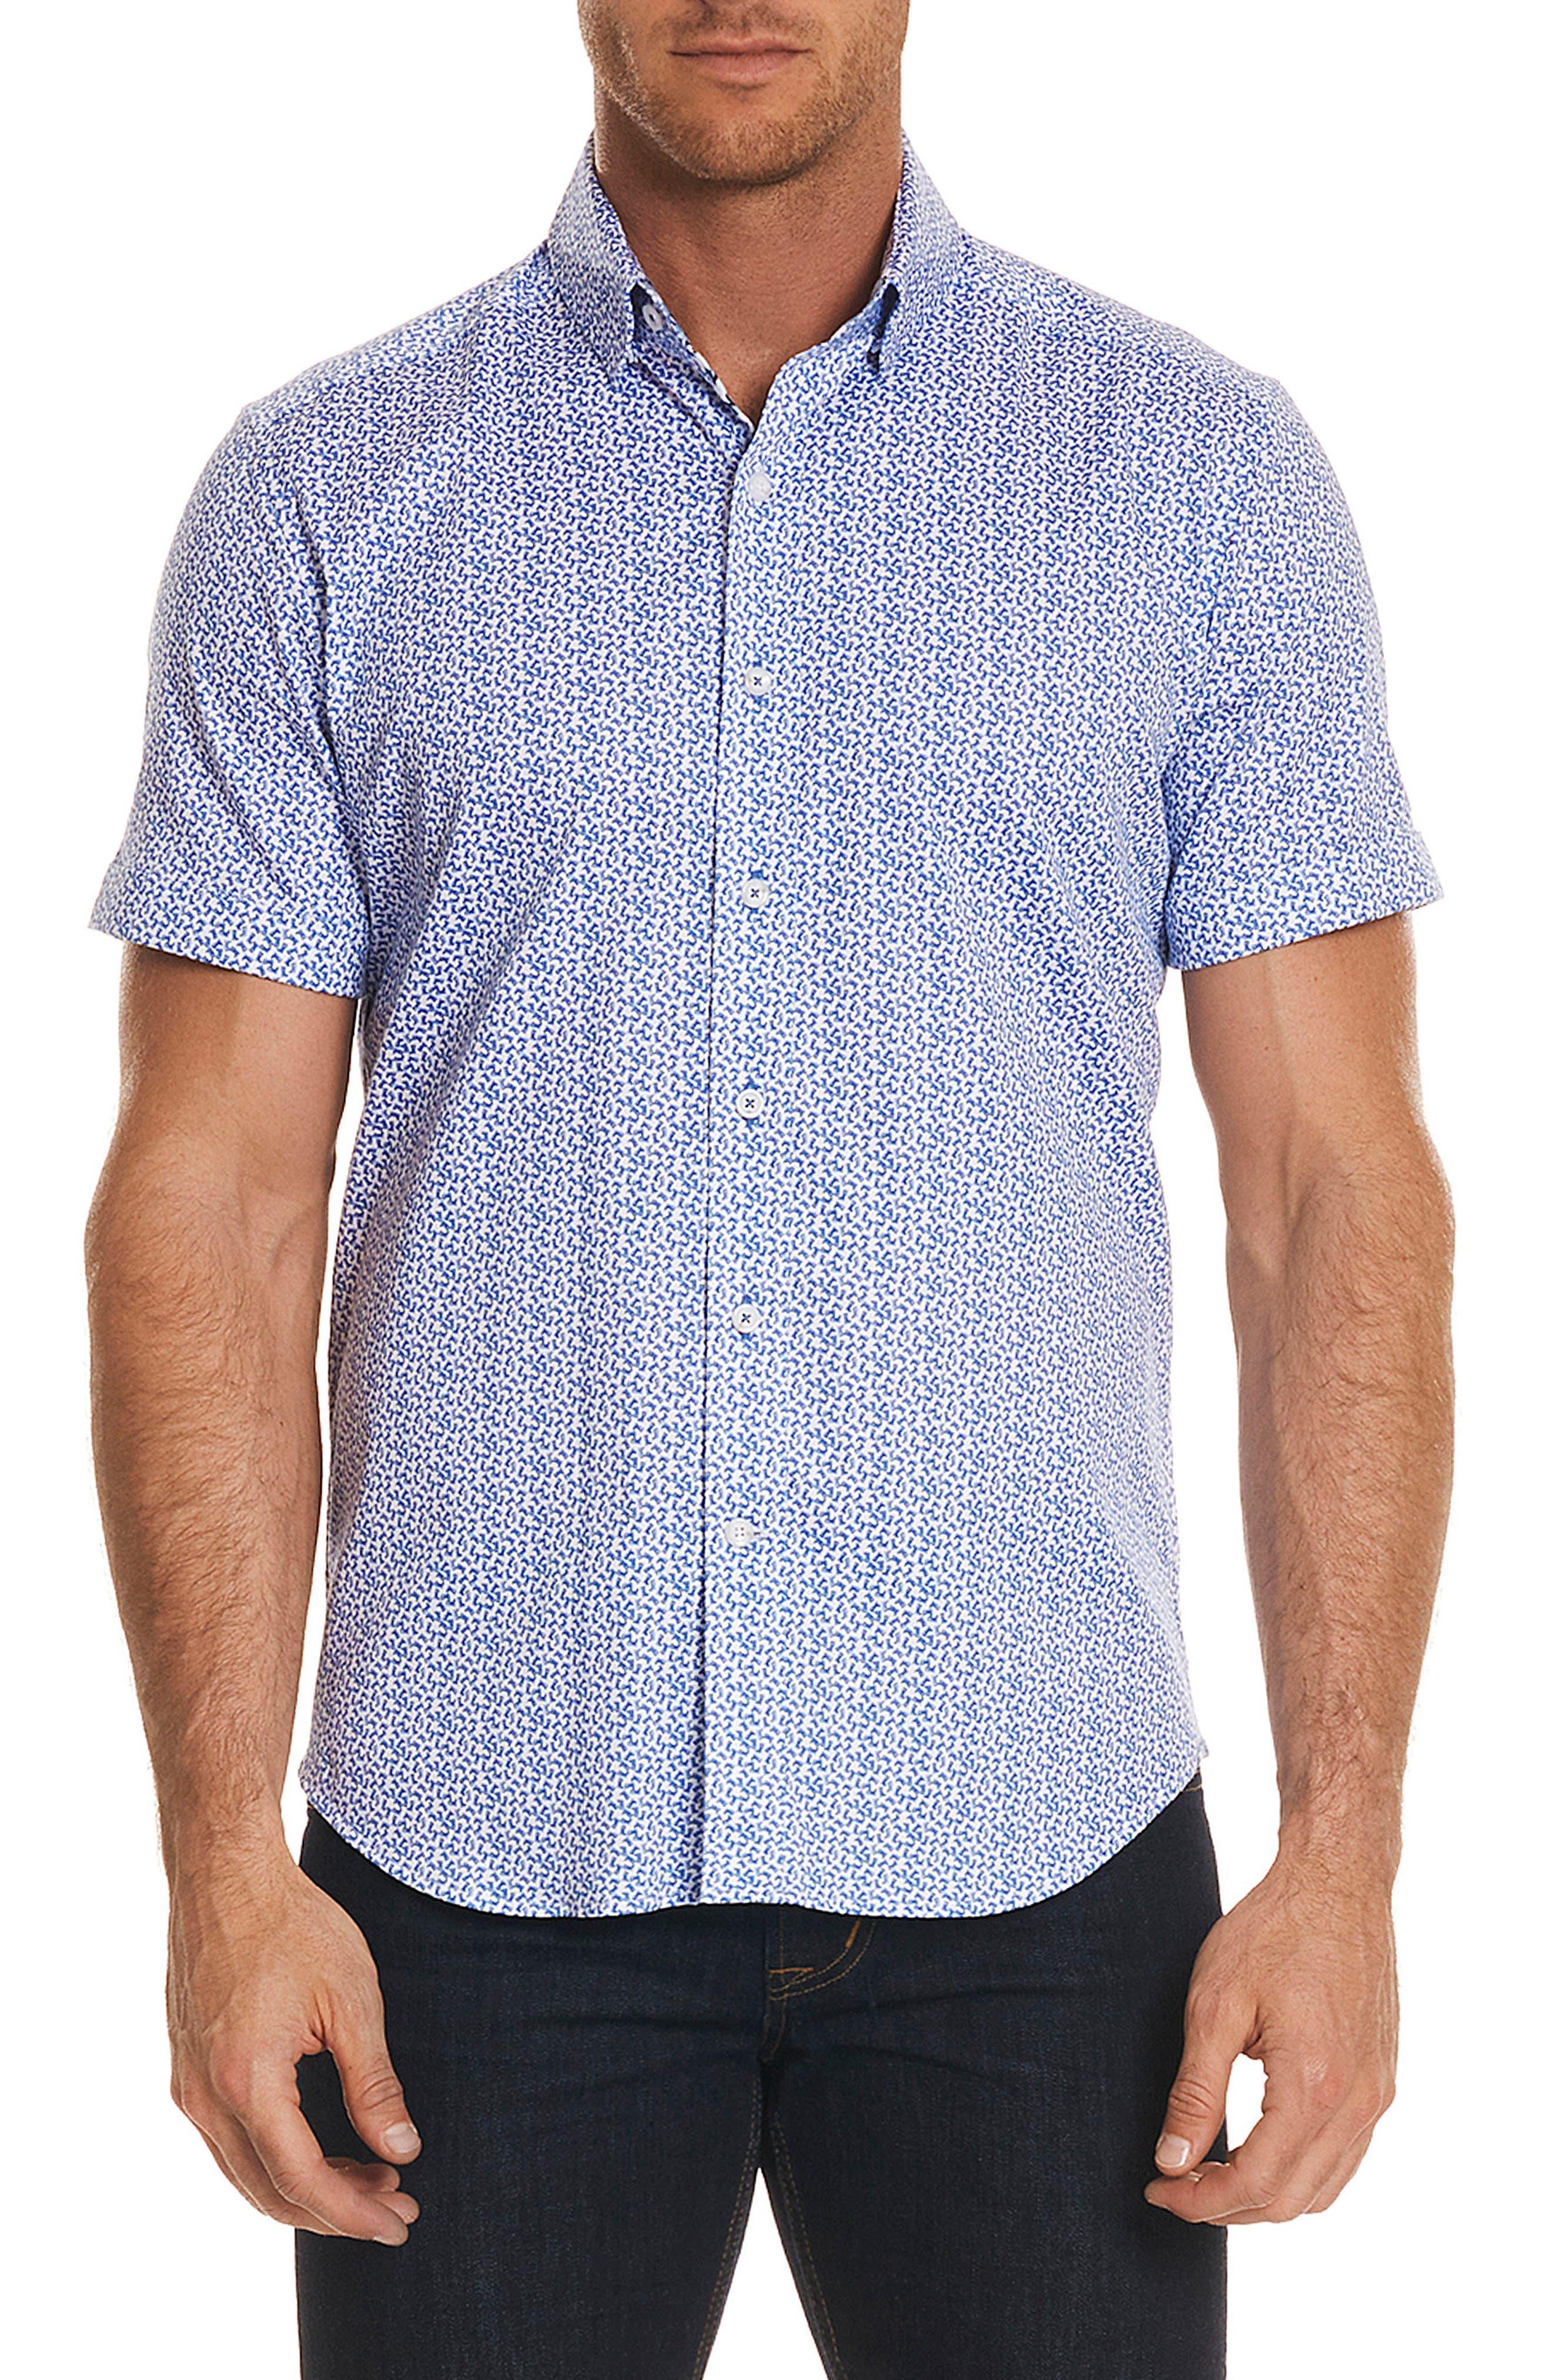 Hartman Tailored Fit Sport Shirt,                         Main,                         color, 400